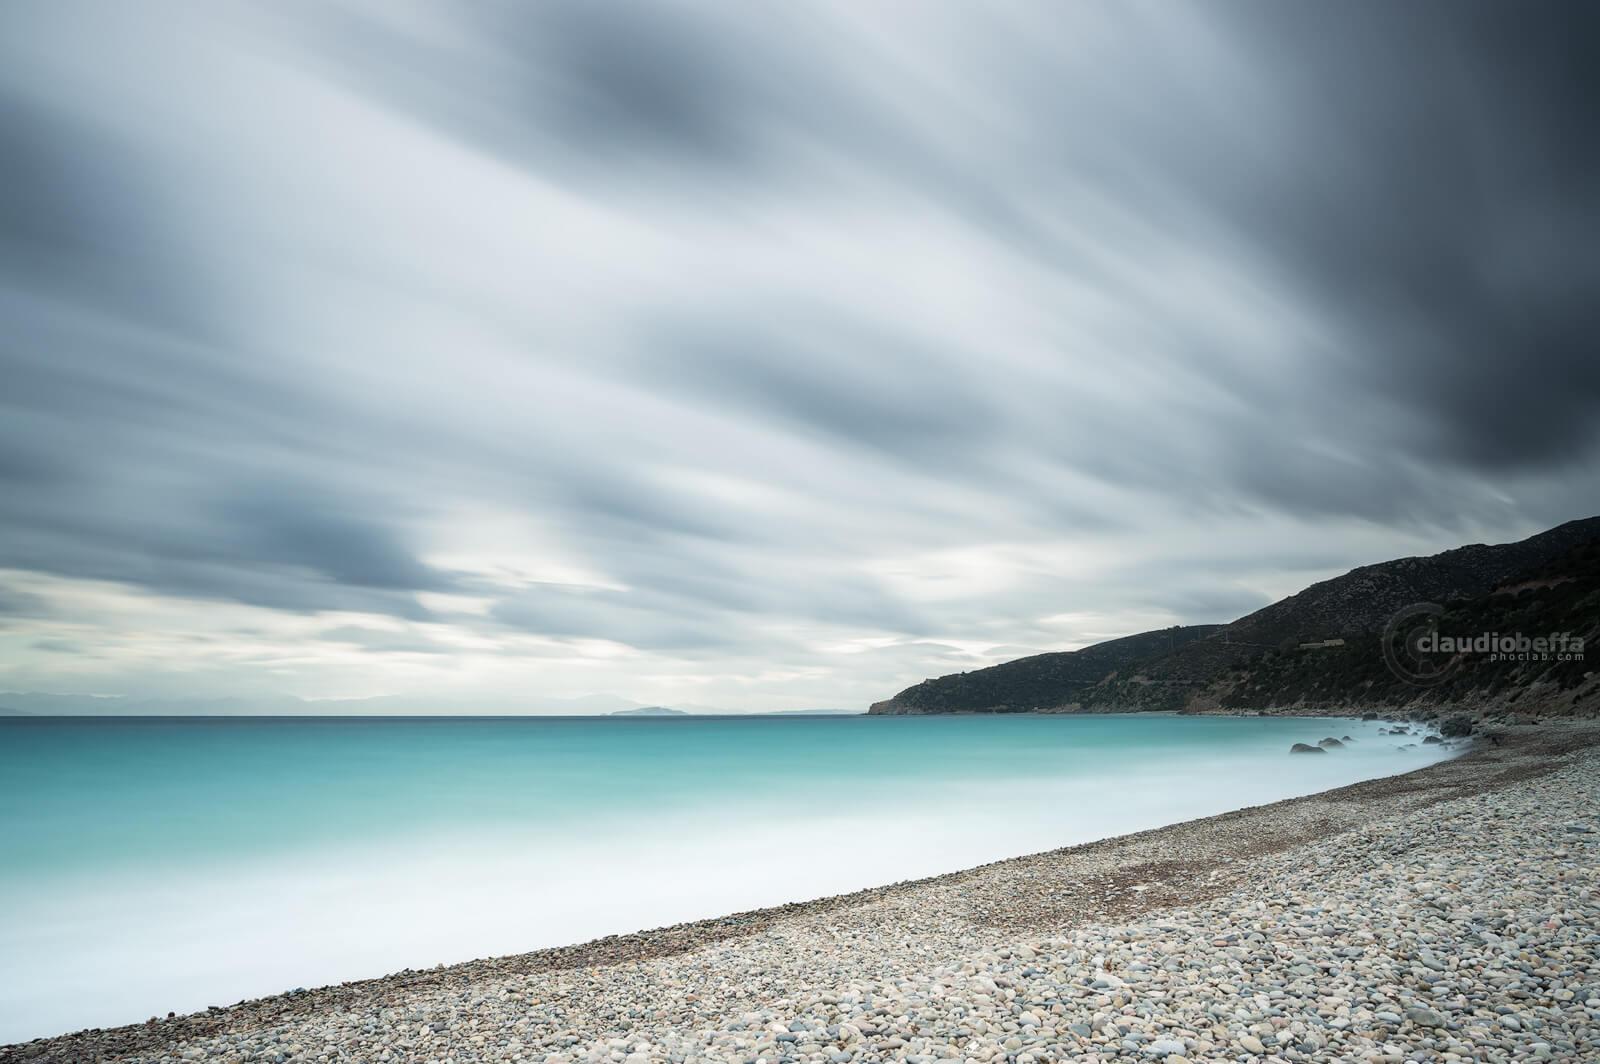 Seascape, Sea, Seashore, Clouds, Storm, Wind, Sardinia, Italy, Before the storm